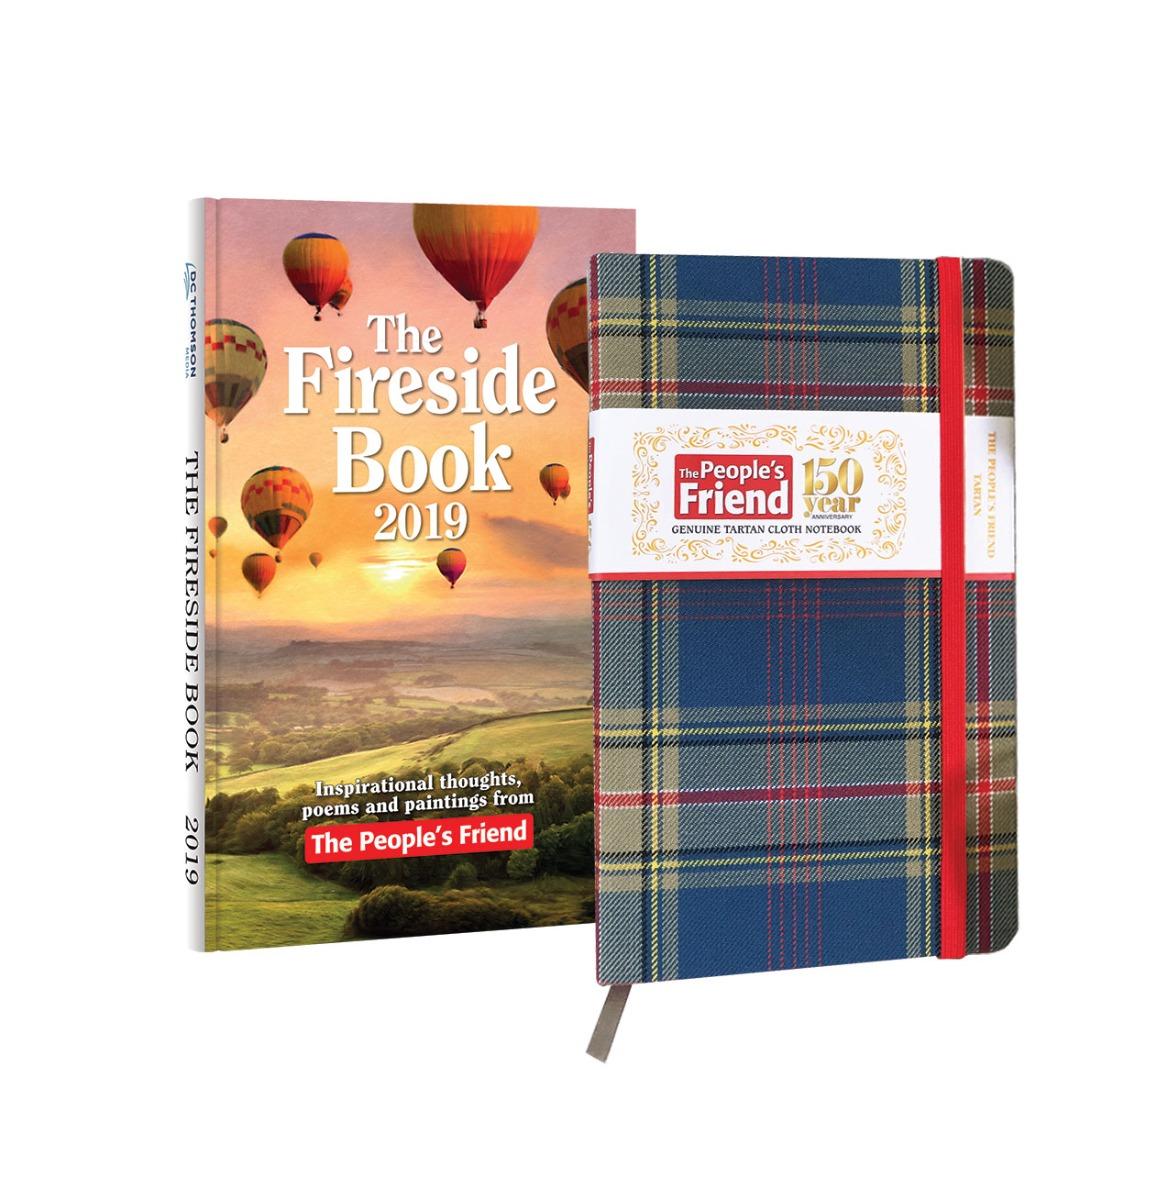 The People's Friend Tartan Notebook & 2019 Fireside Book Pack